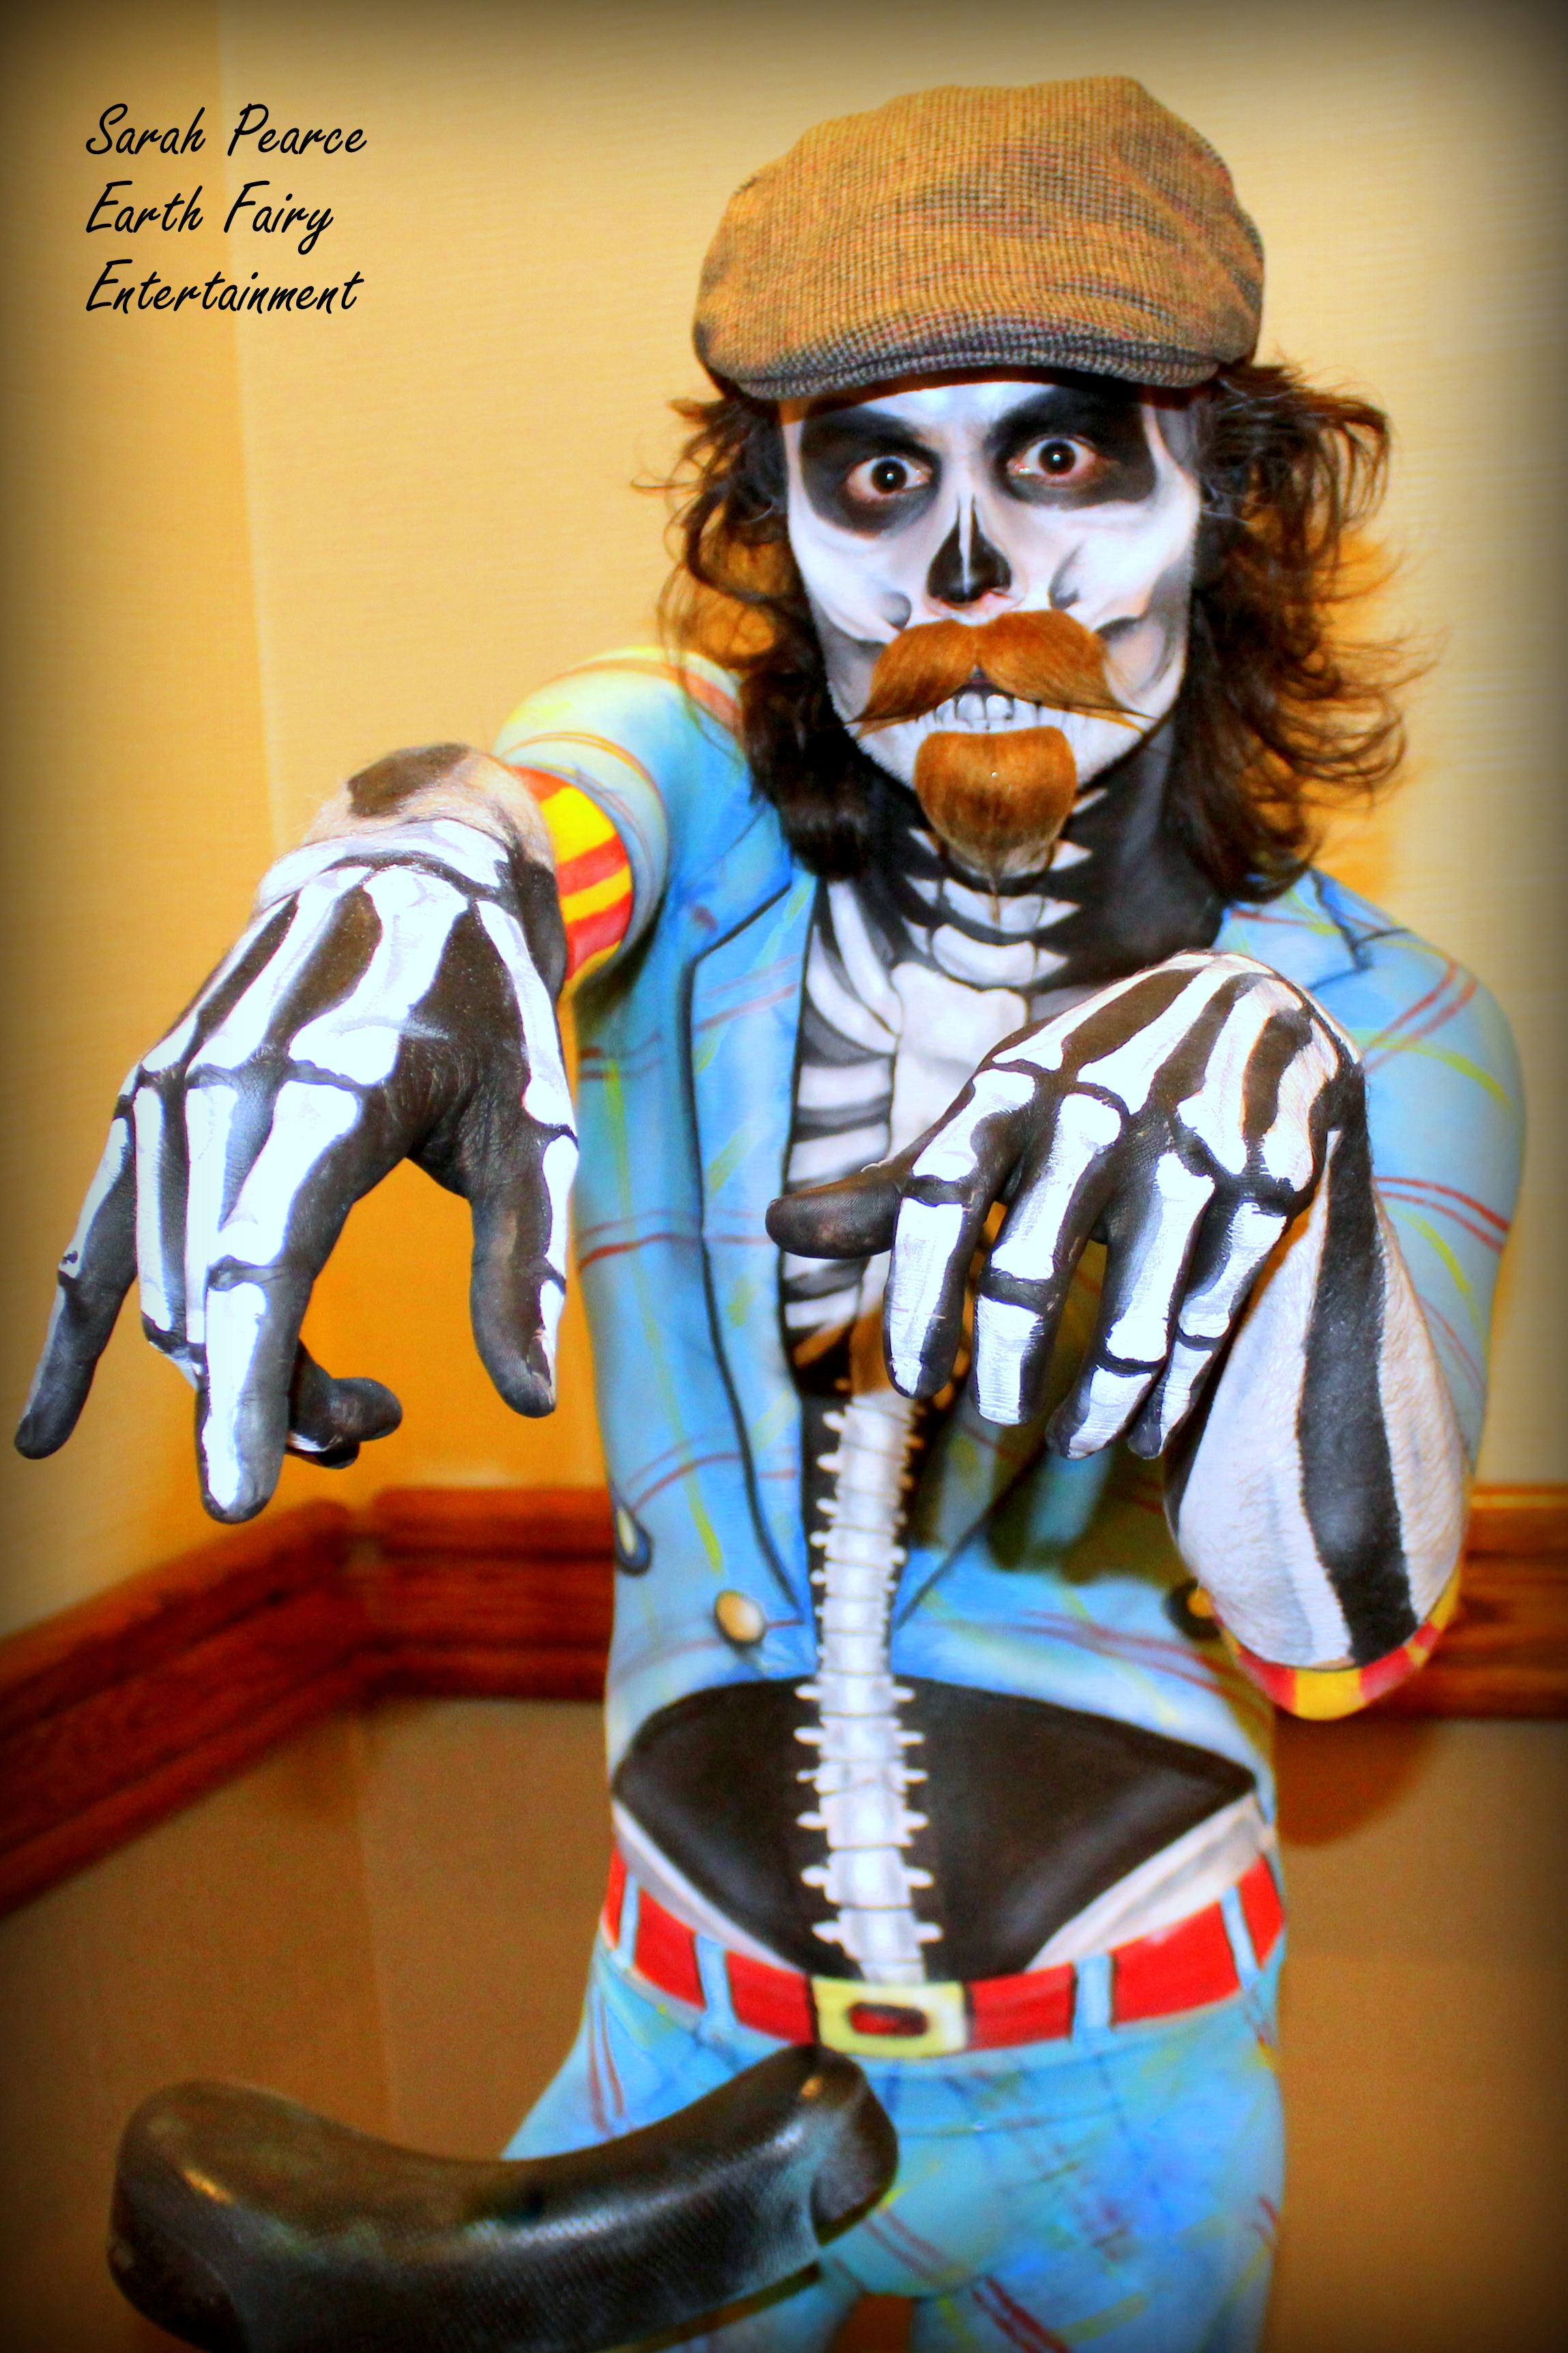 Portlandia Skeleton body paint by artist Sarah Pearce in Portland  Oregonwith Earth Fairy Entertainm